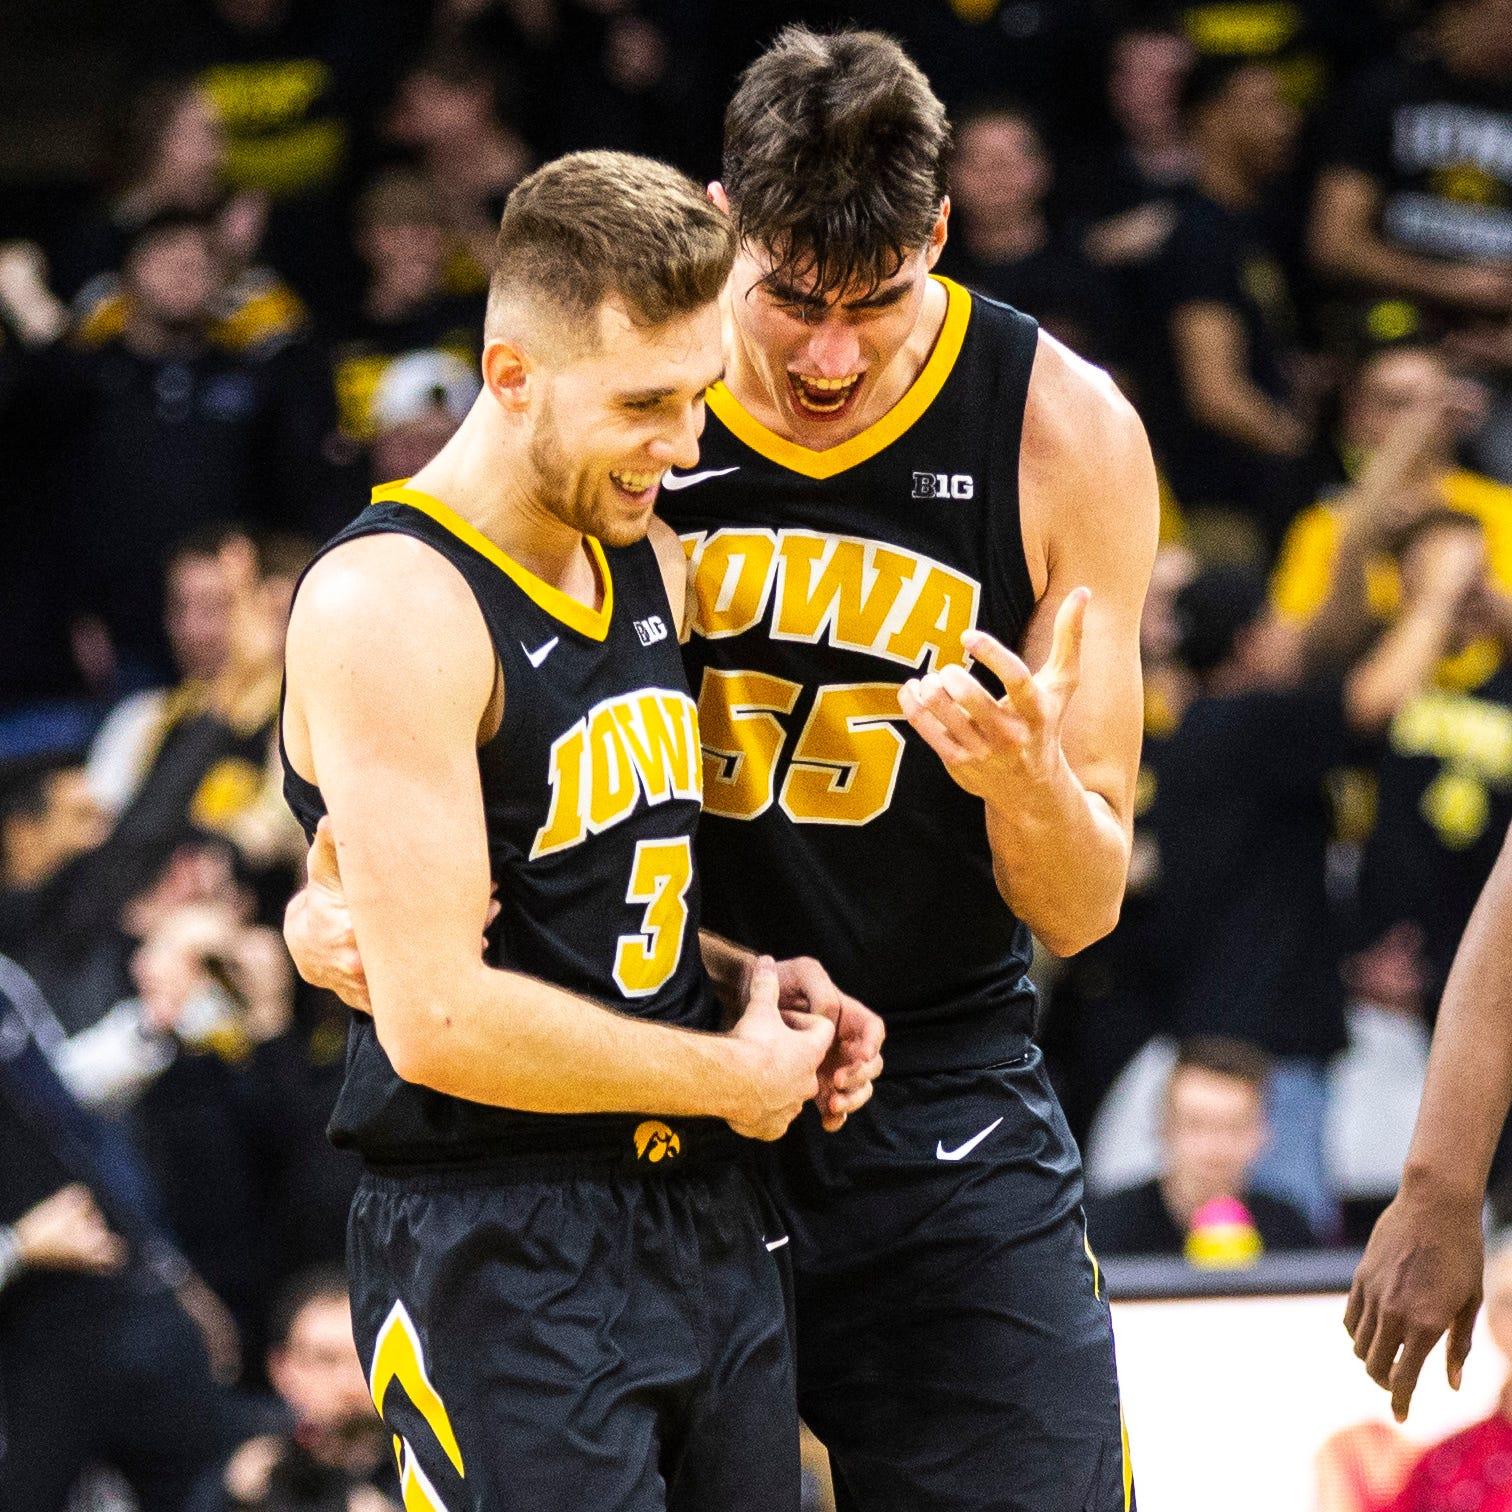 Riding four-game losing streak, Hawkeye basketball players take a break from Twitter